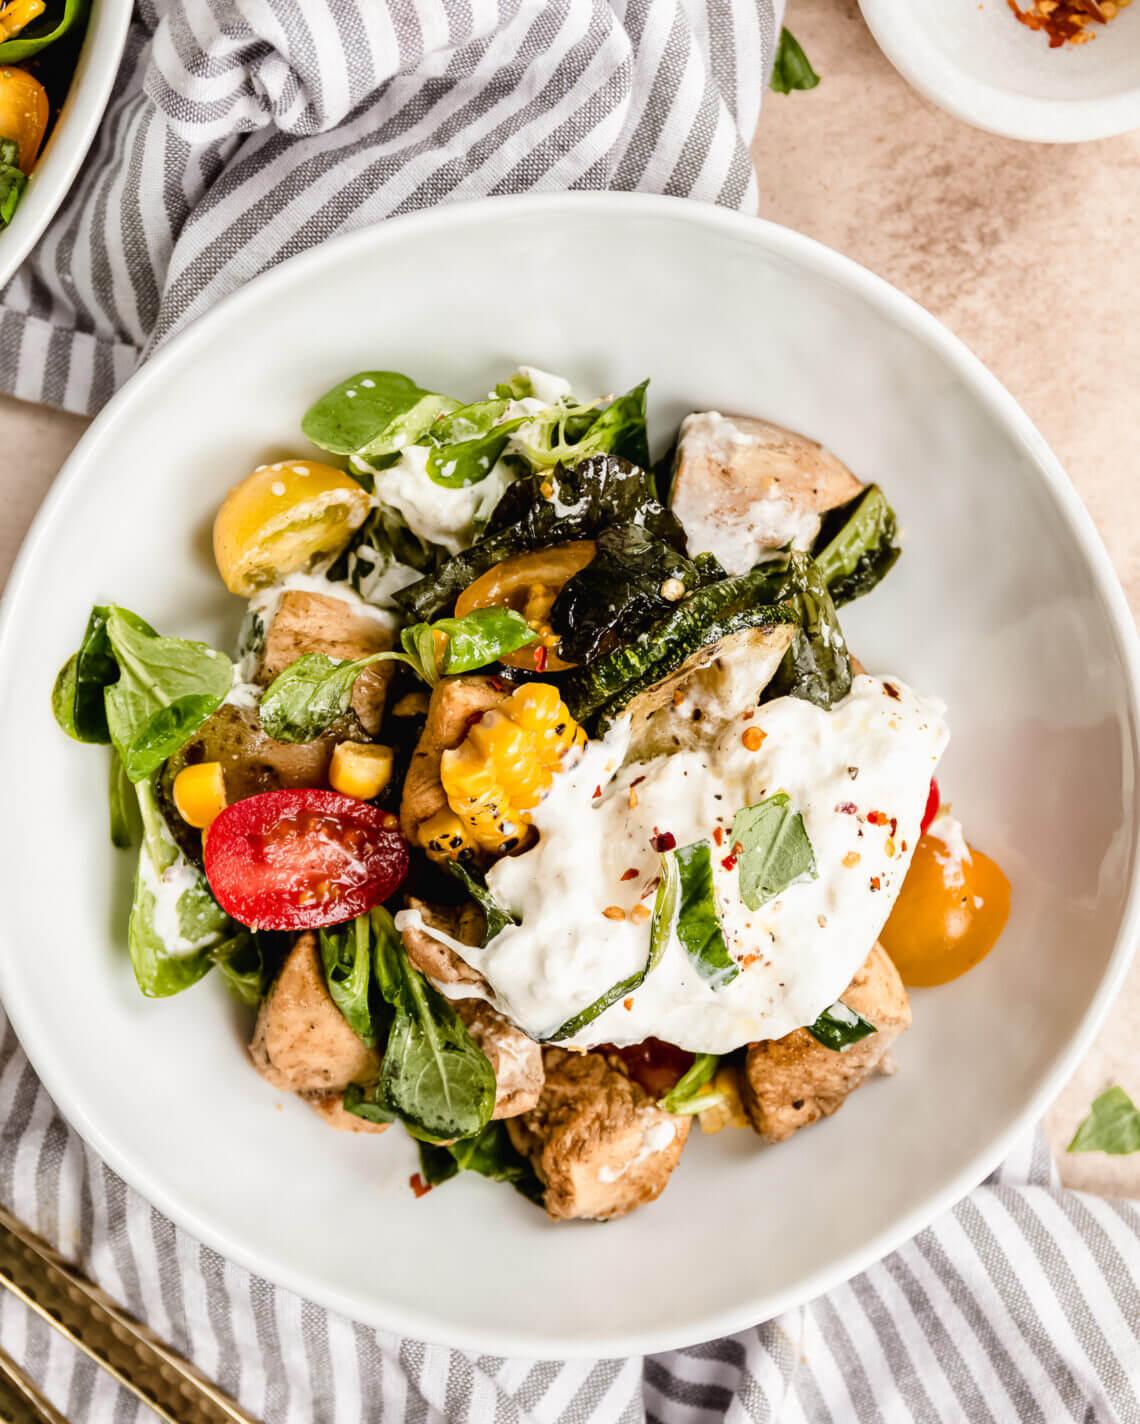 salade met burrata